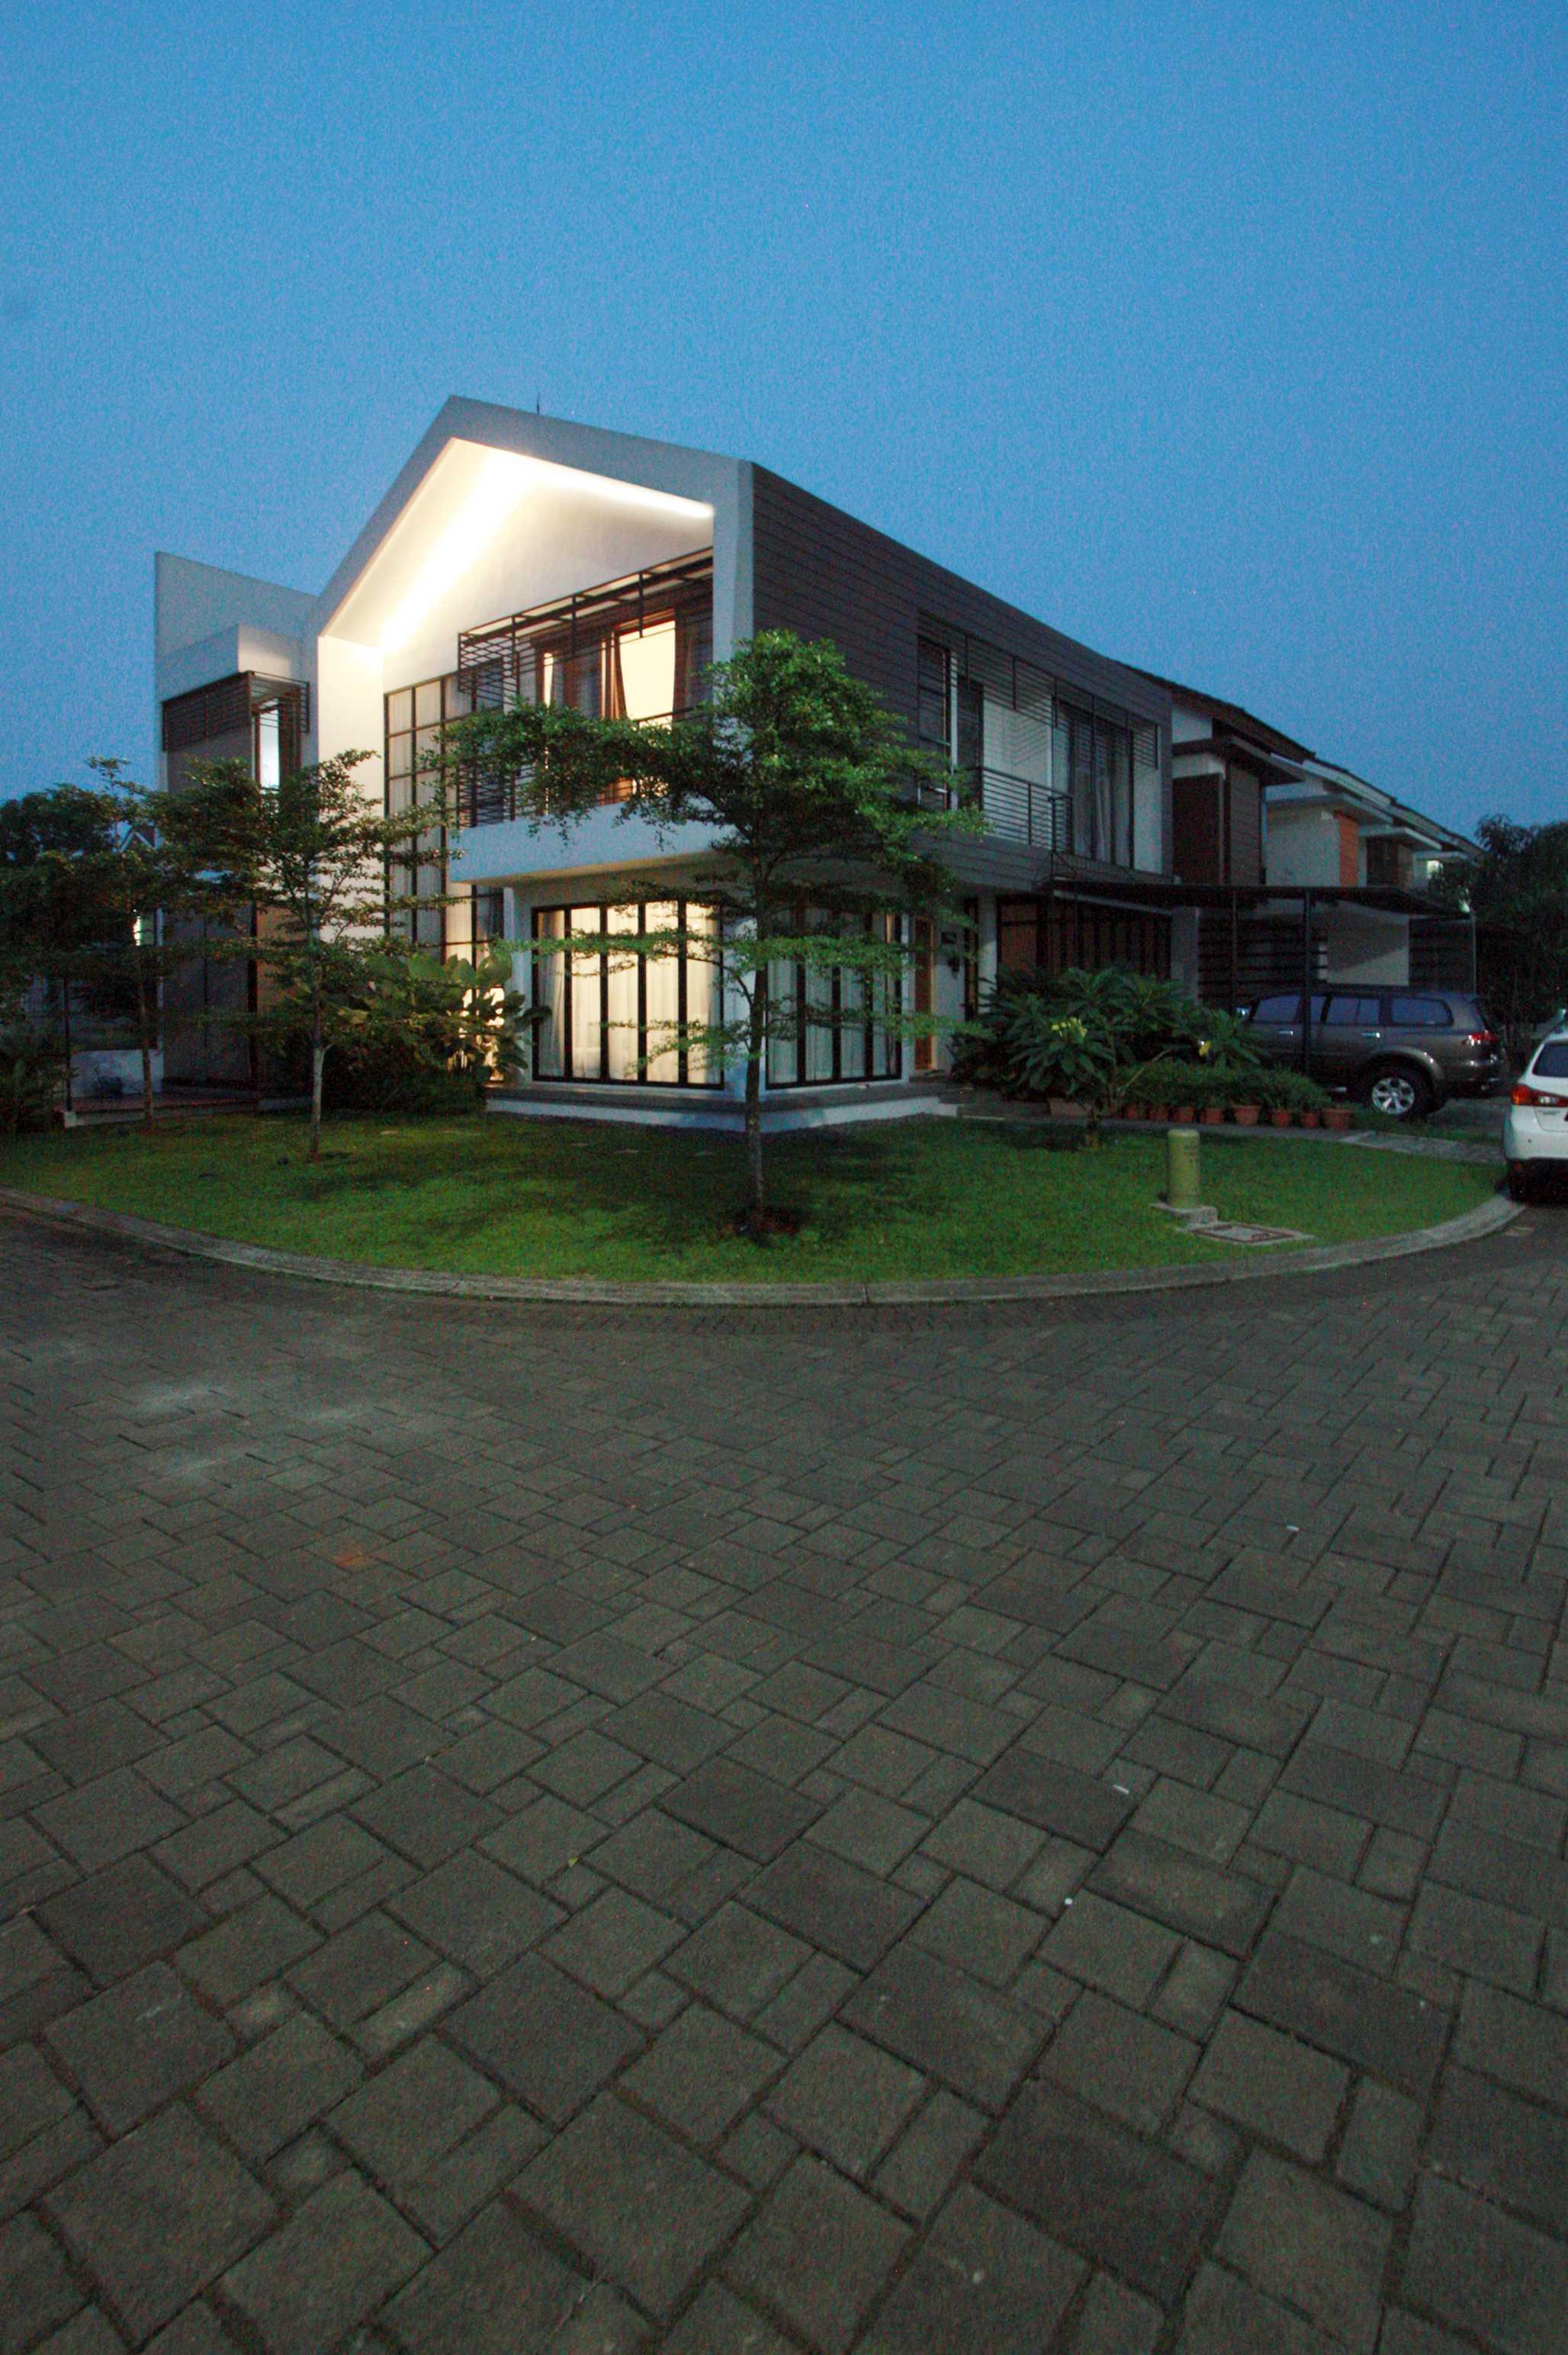 Ddap Architect Foresta Fiore House Bsd Tangerang Bsd Tangerang E2   44381